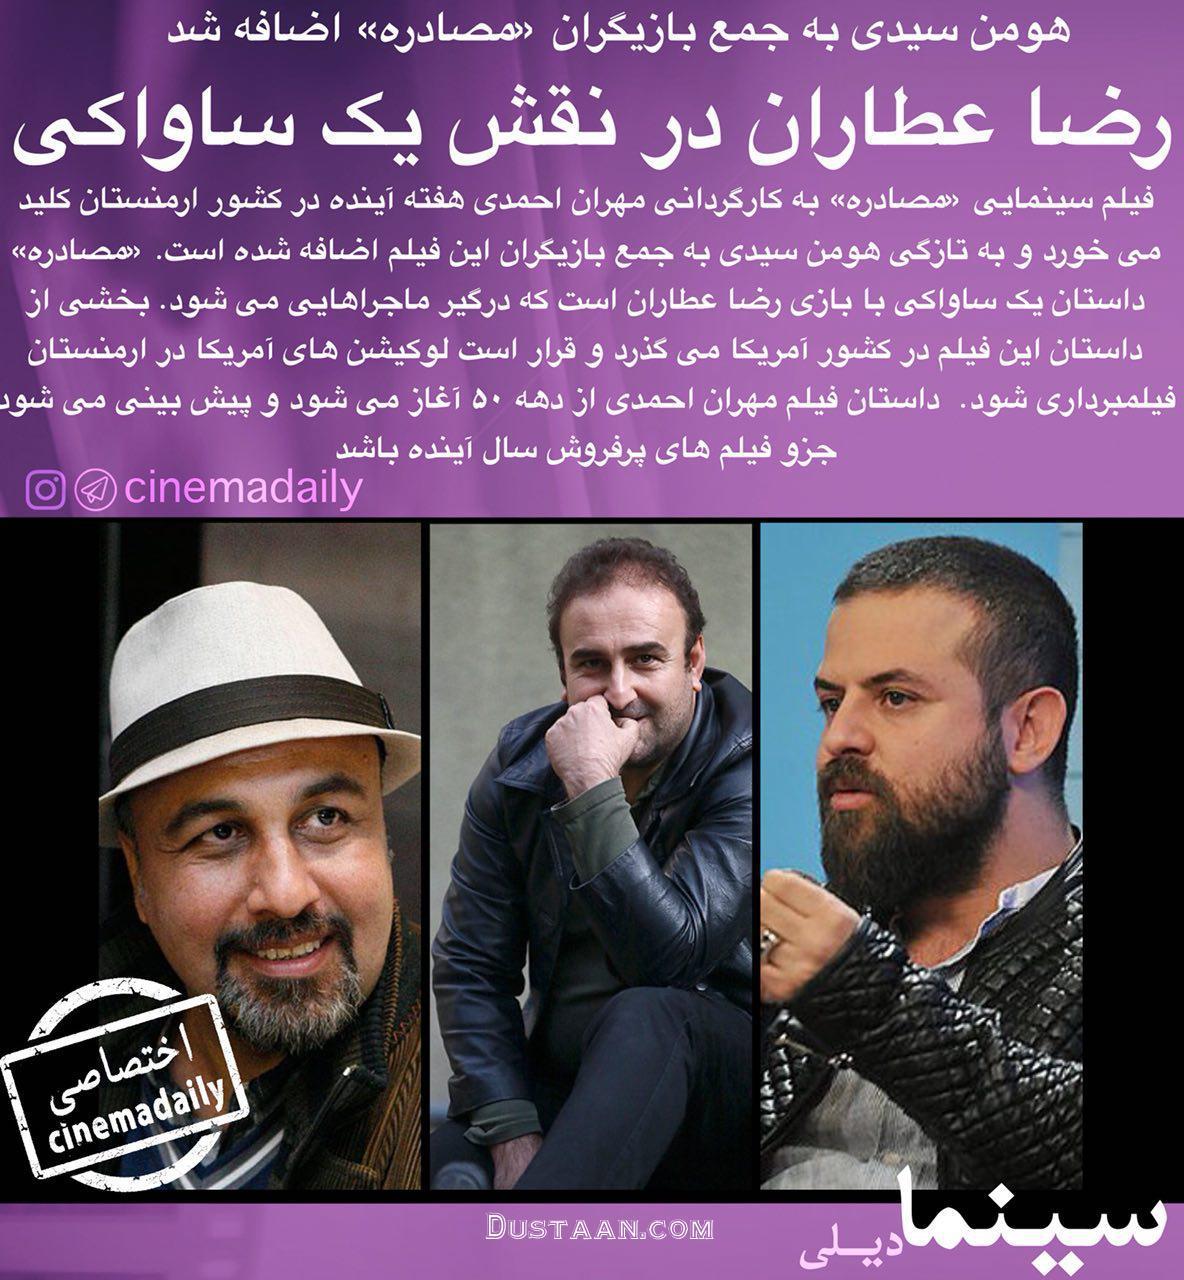 www.dustaan.com رضا عطاران در نقش یک ساواکی! +عکس